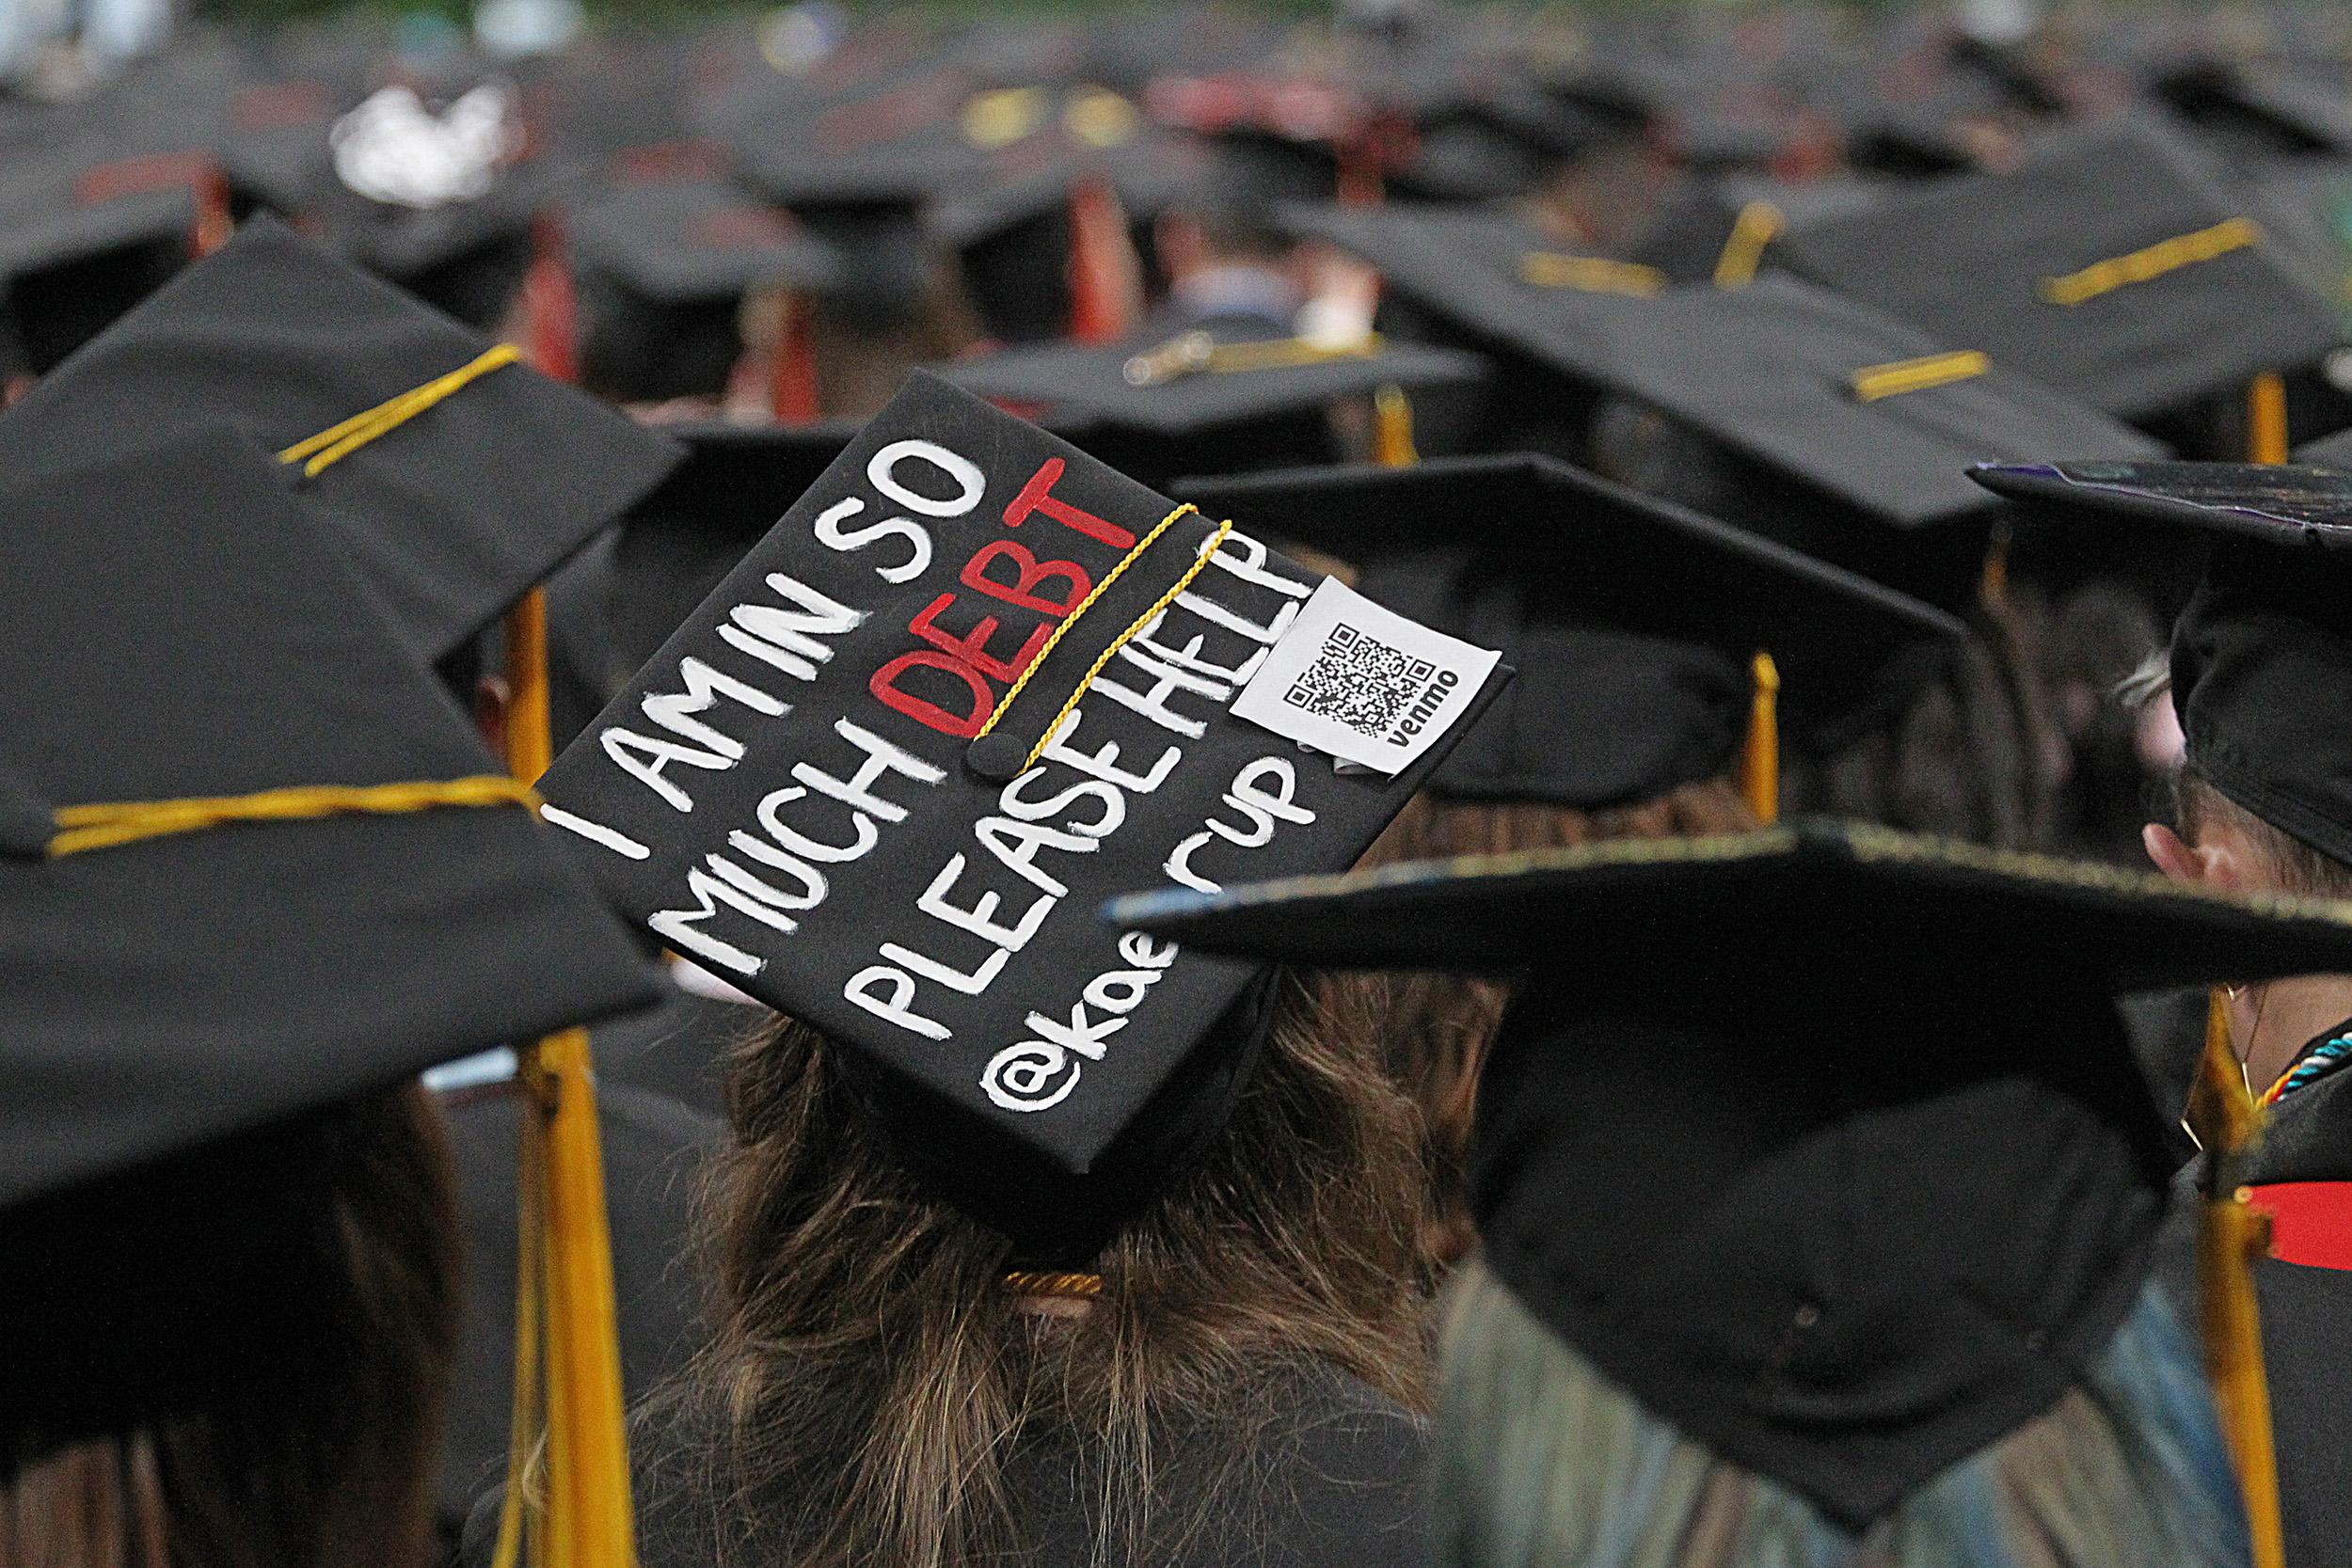 Most Black voters support eliminating student loan debt, new survey finds